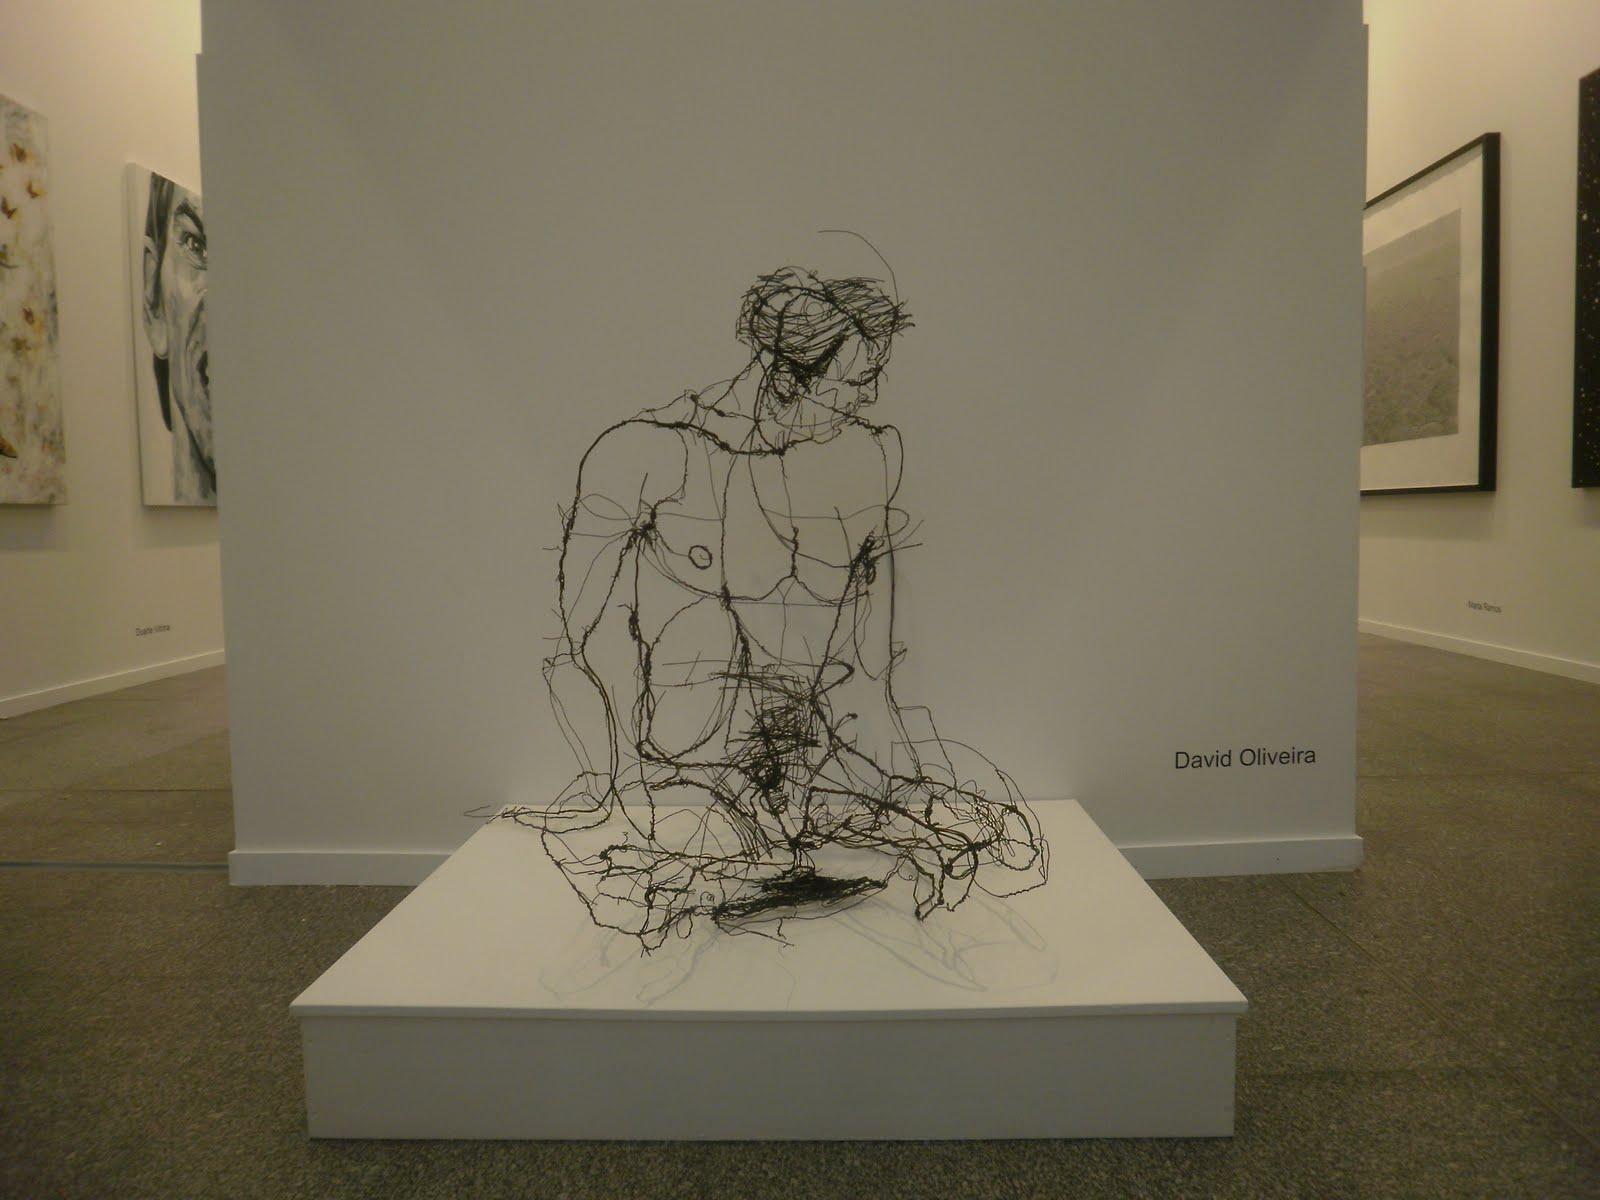 'Scribble Sculptures' by David Oliveira – wire sculptures